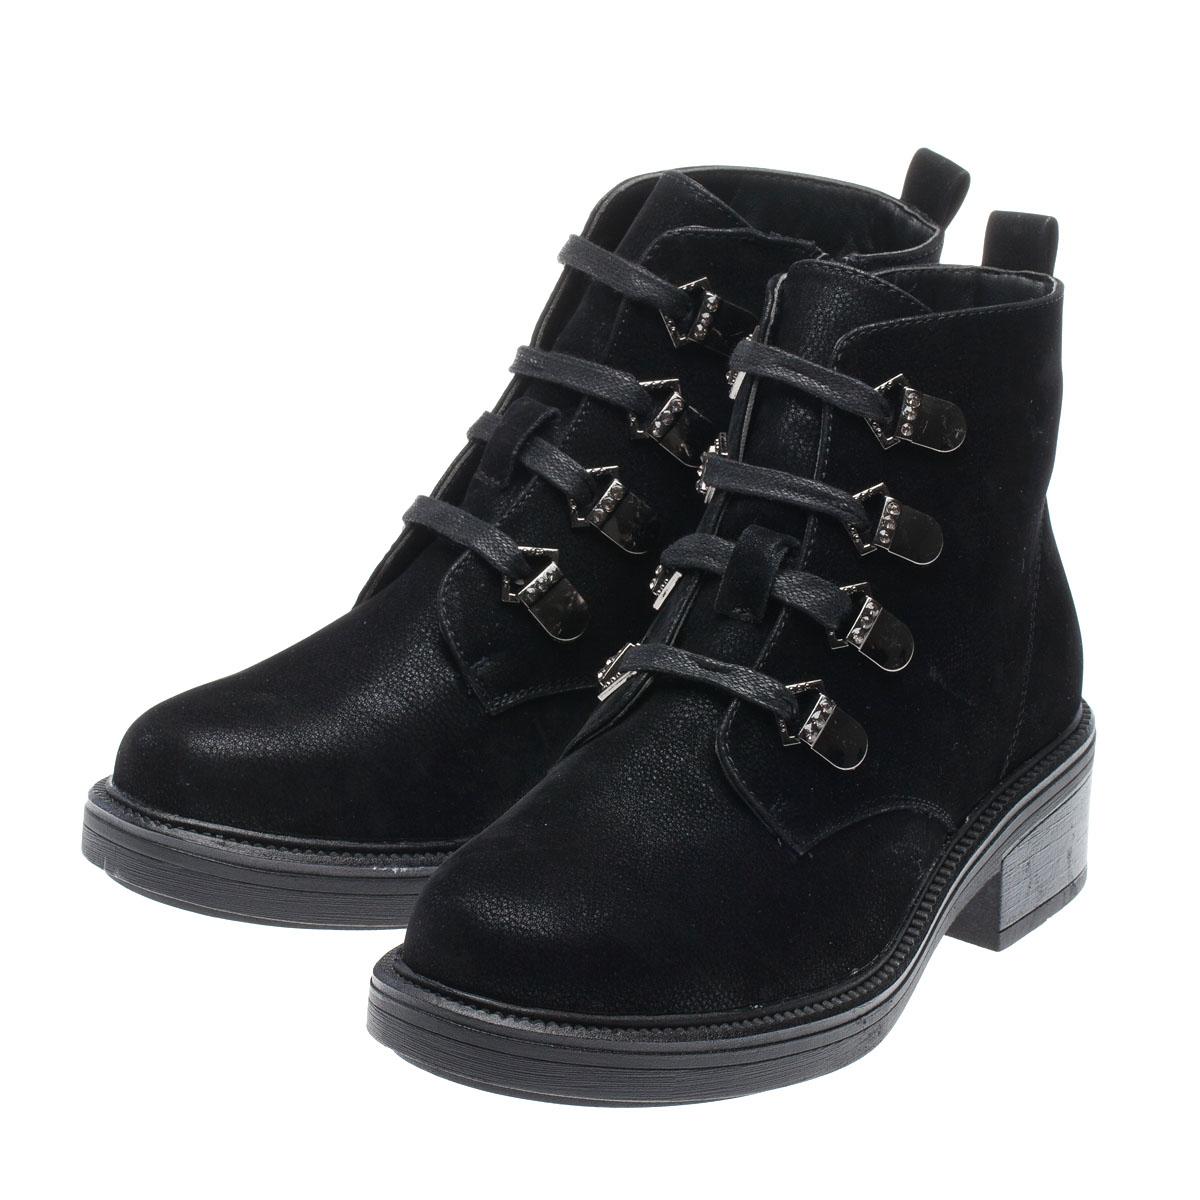 Ботинки зимние FERTO, F17-6065-3 цена